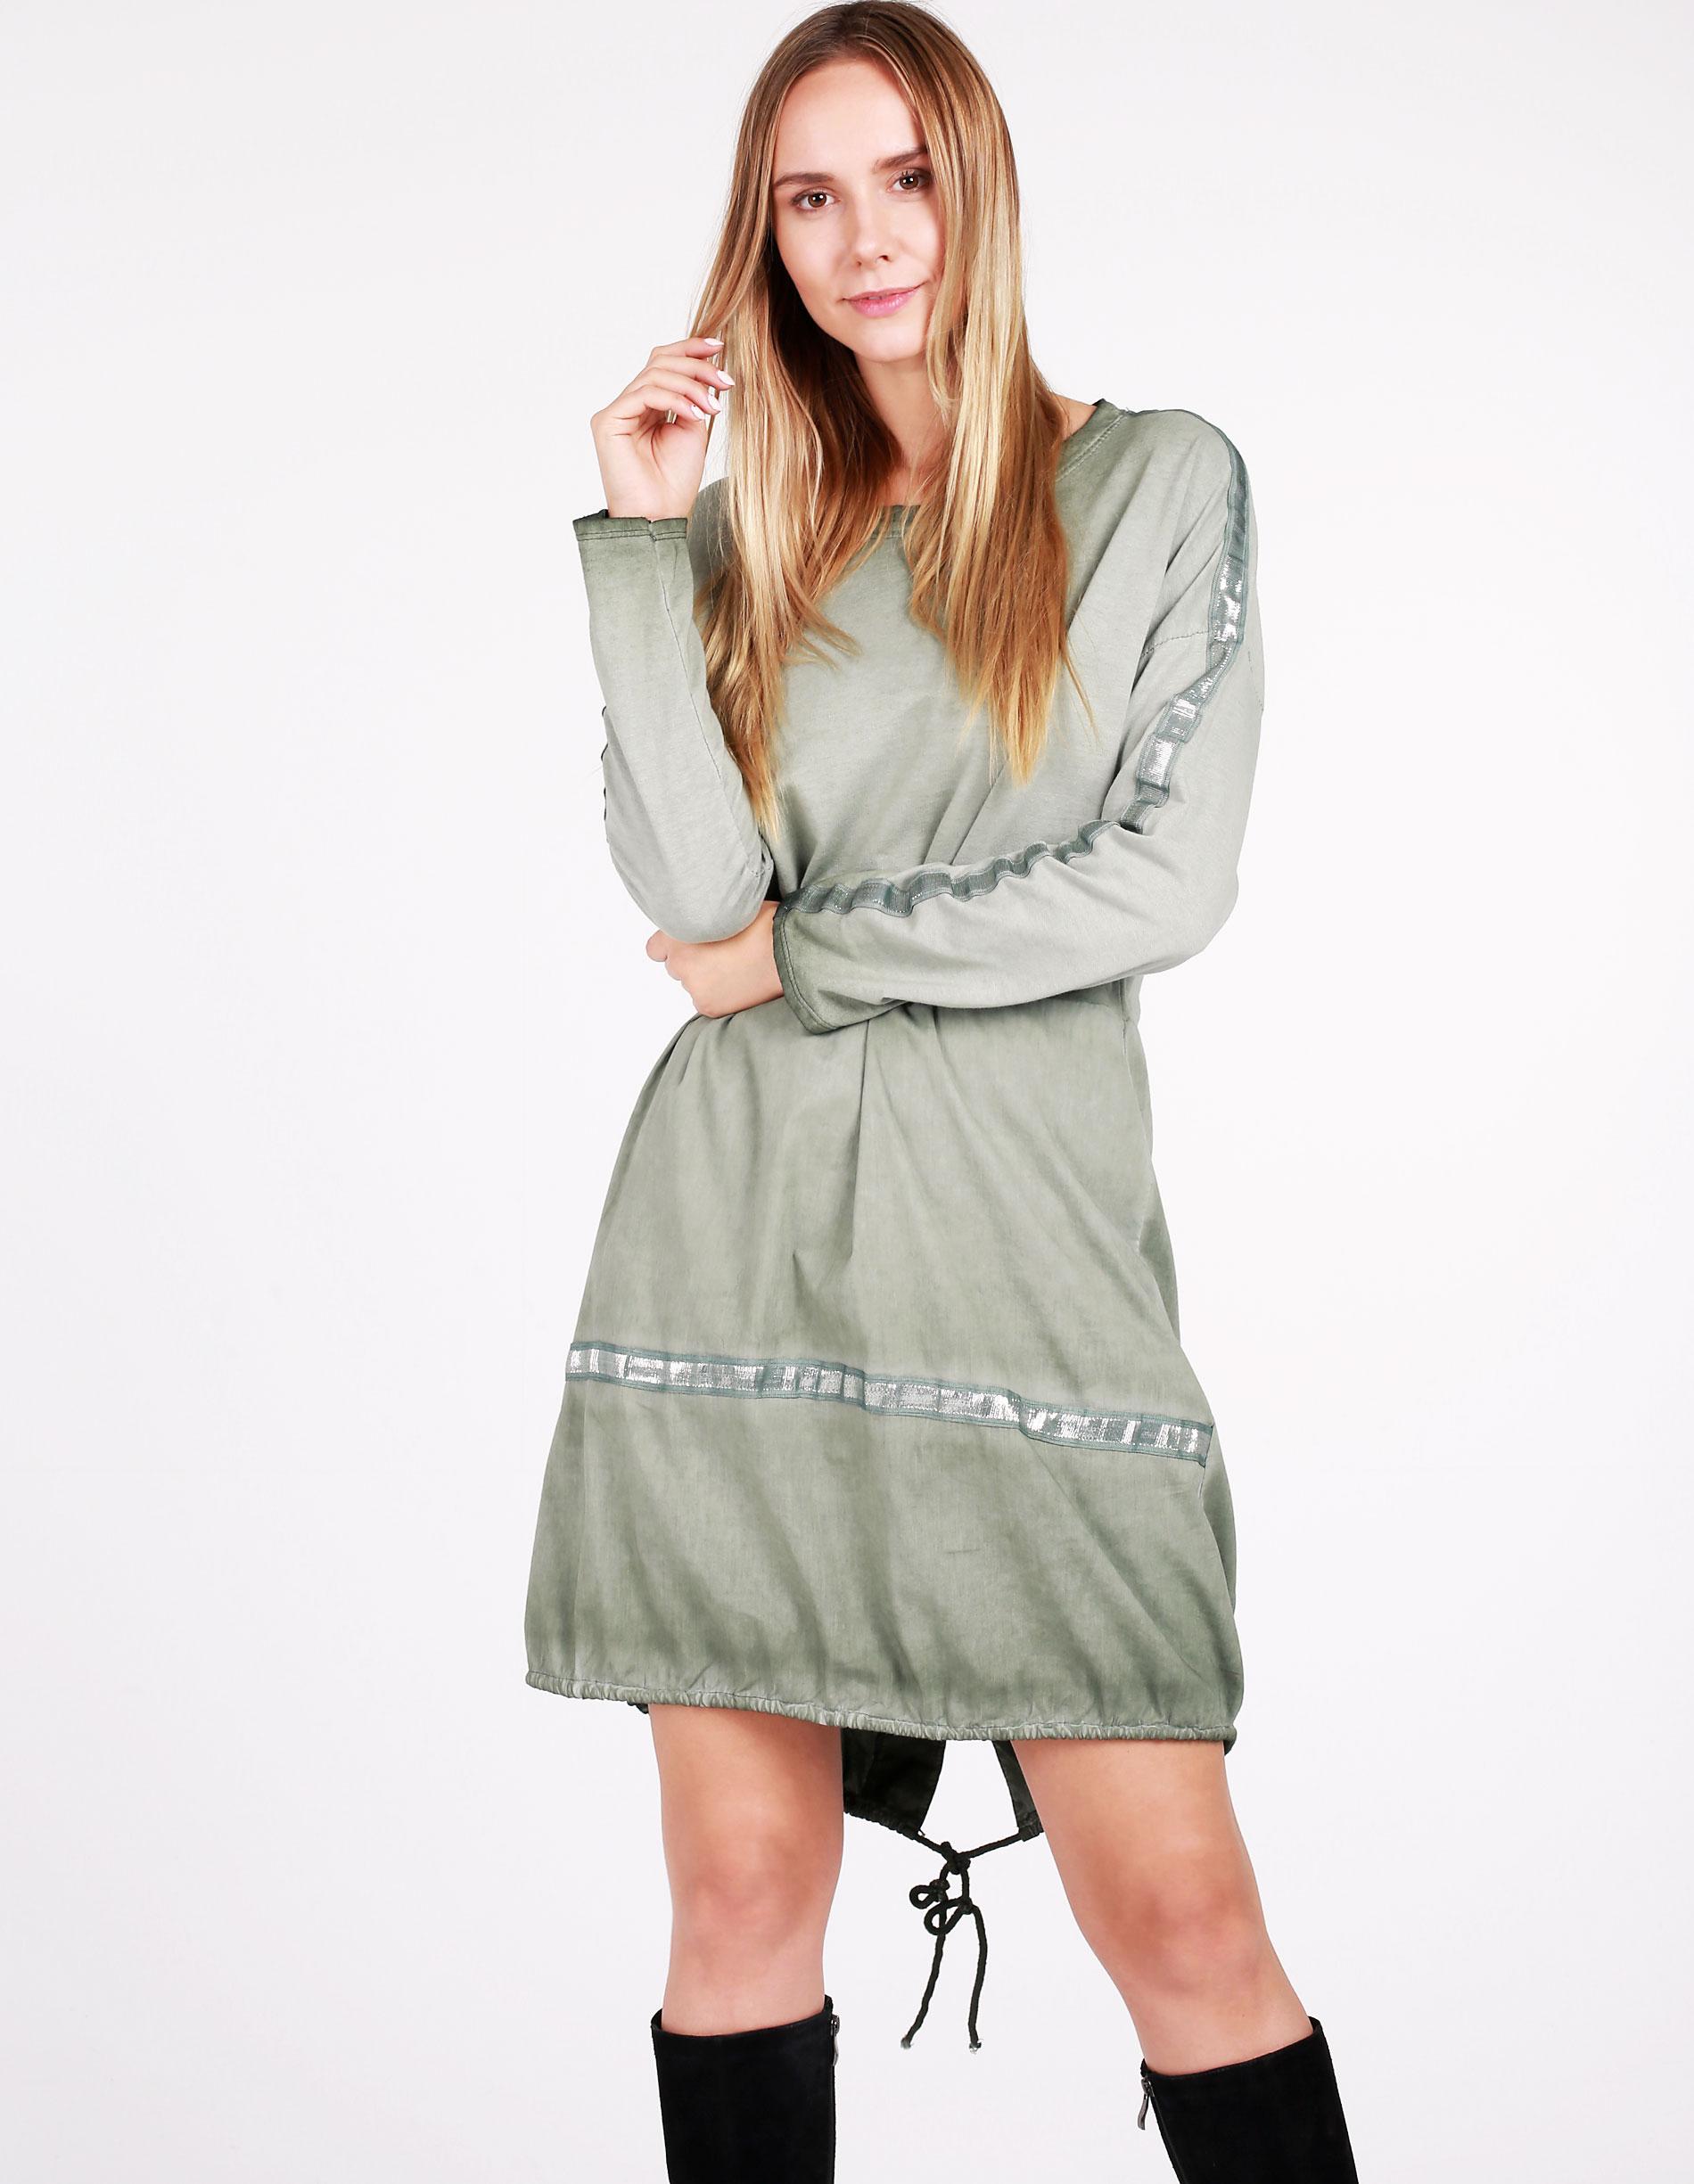 Sukienka - 45-9181 MILIT - Unisono